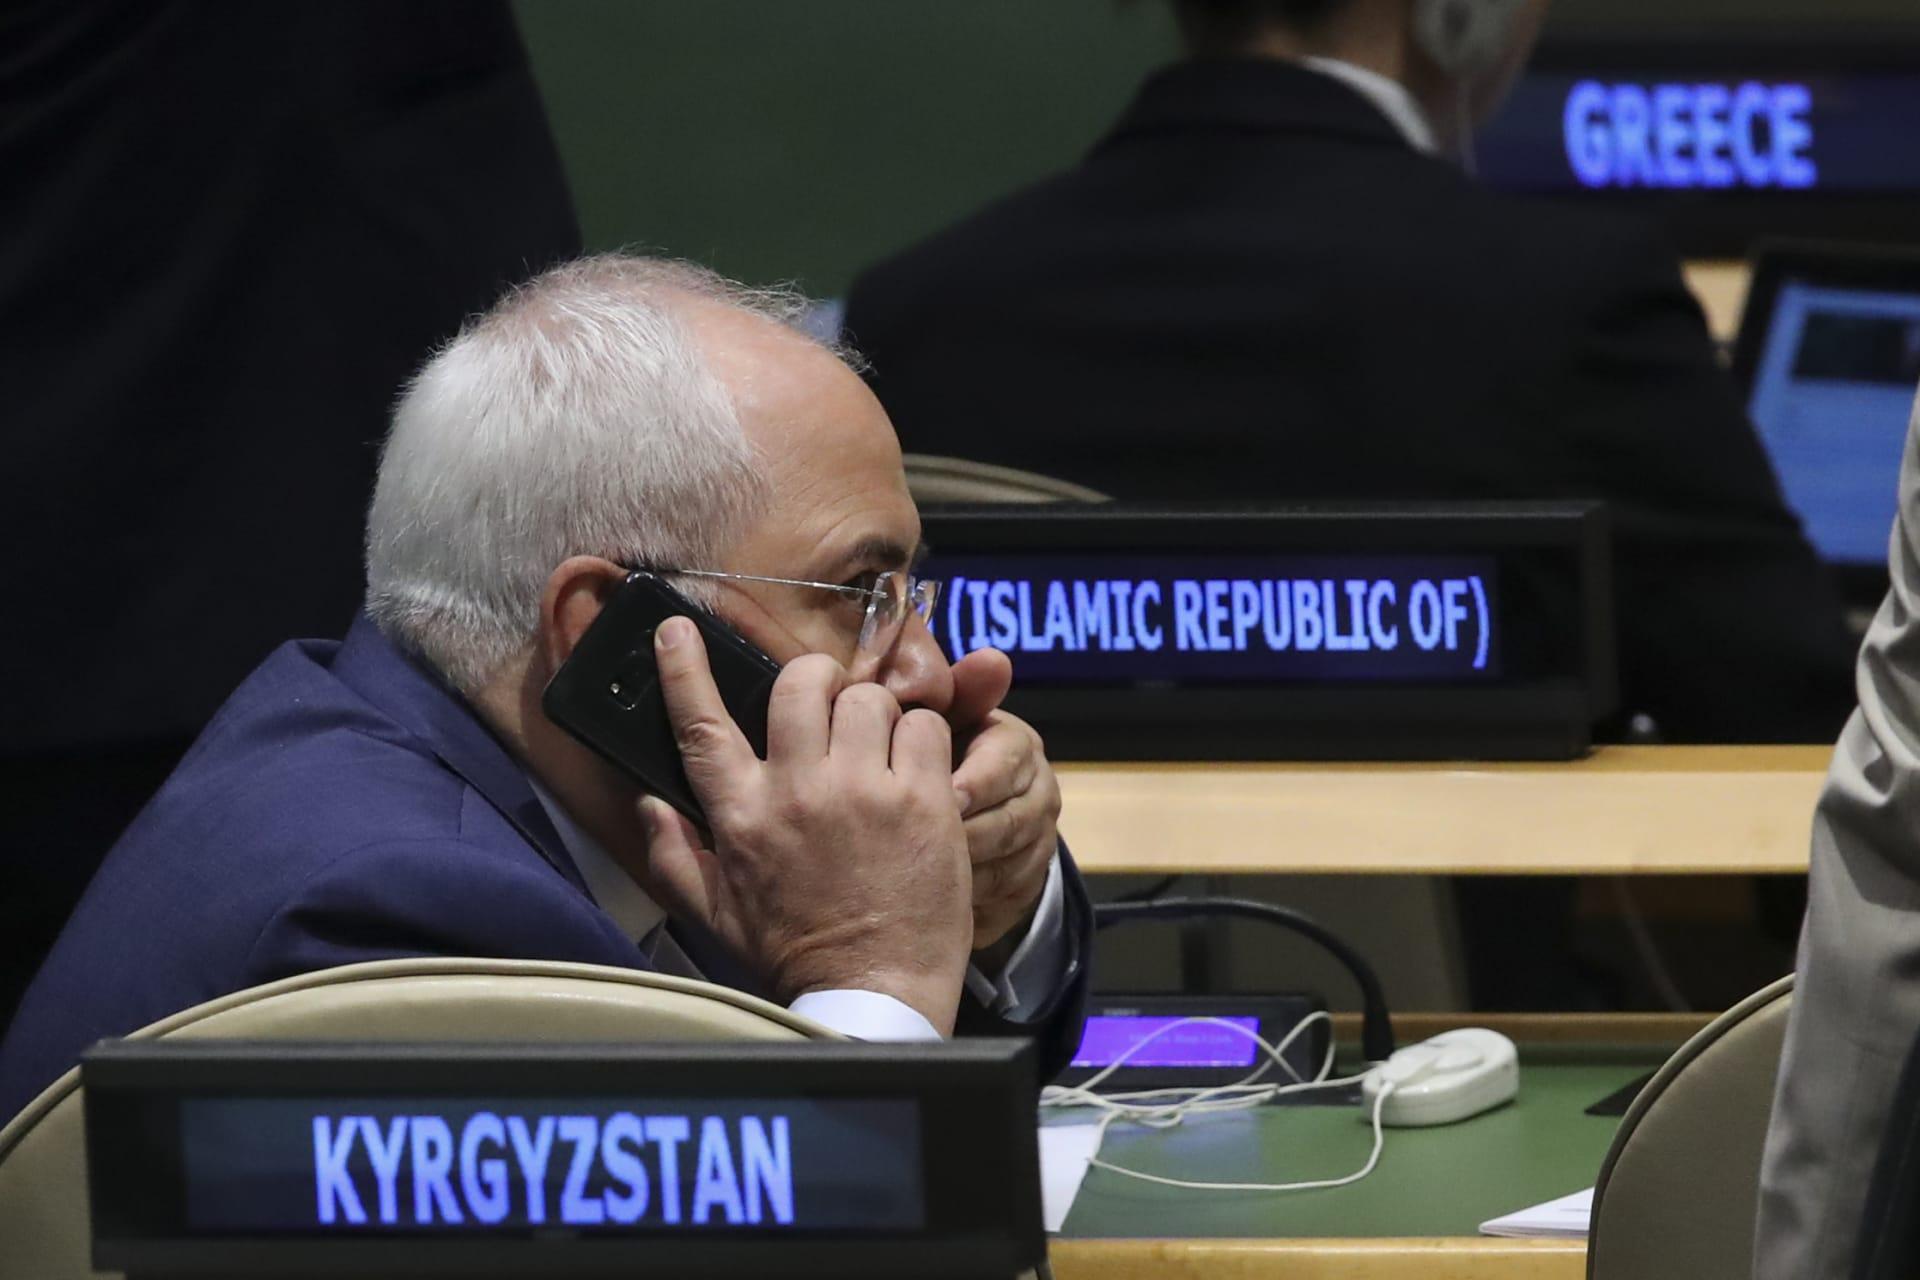 إيران ترد على اتهامها باختراق هواتف مسؤولين إسرائيليين